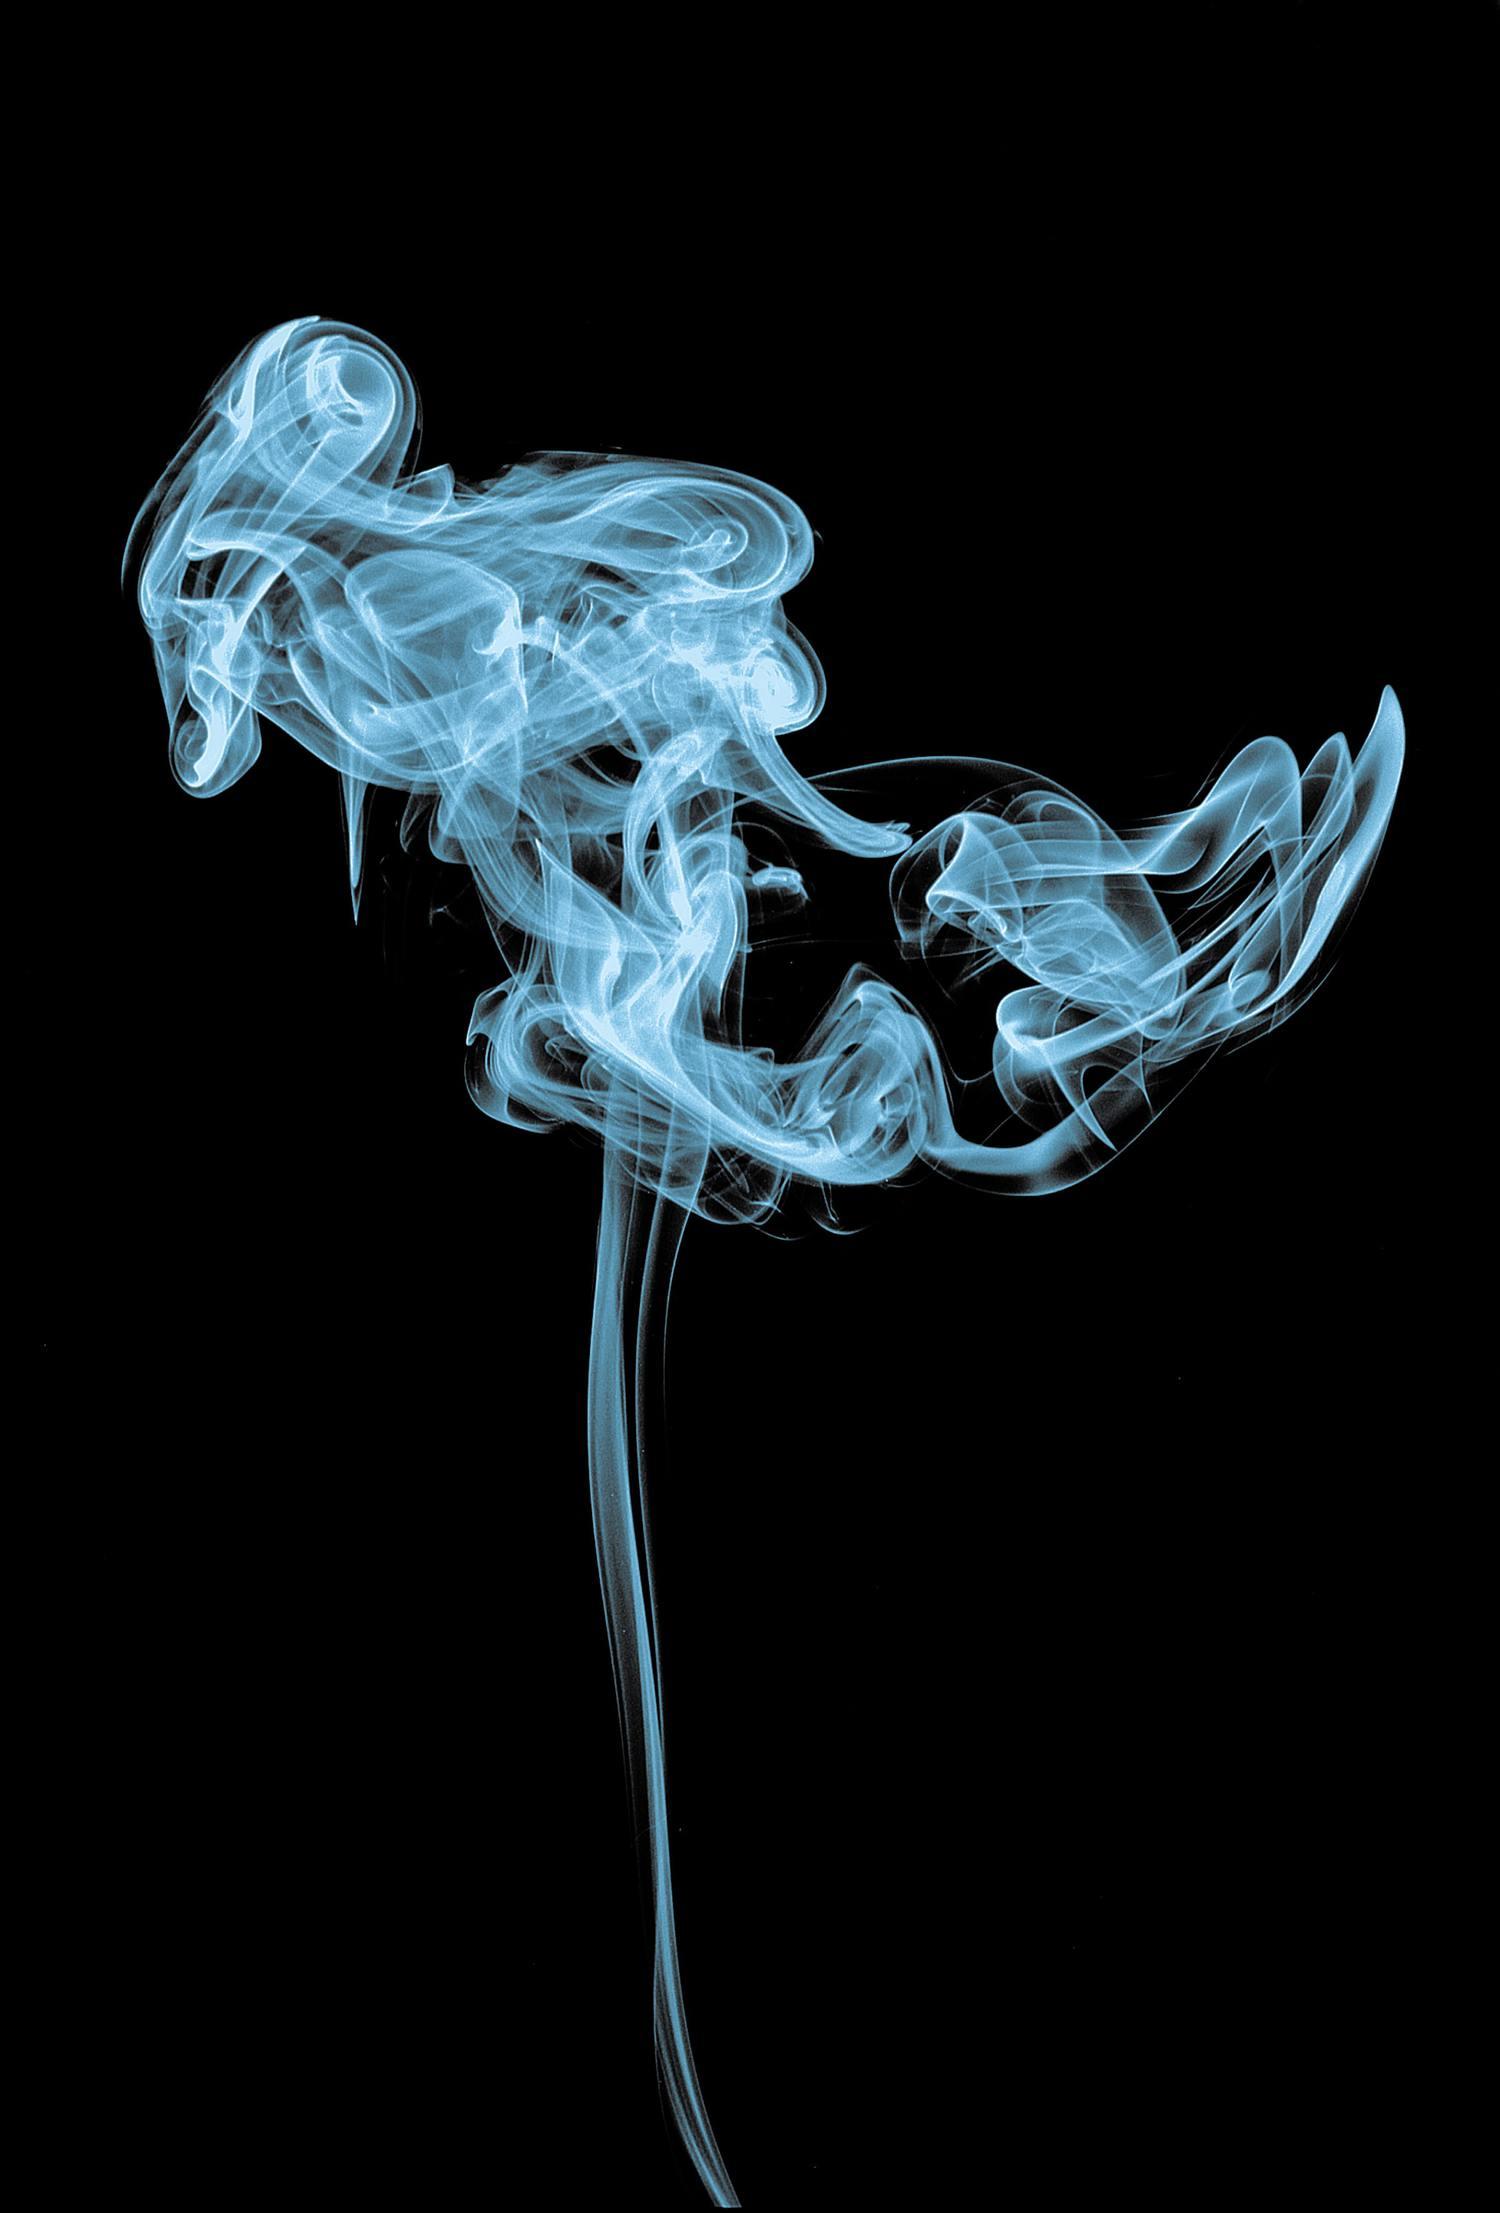 fotografía humo técnica fotográfica